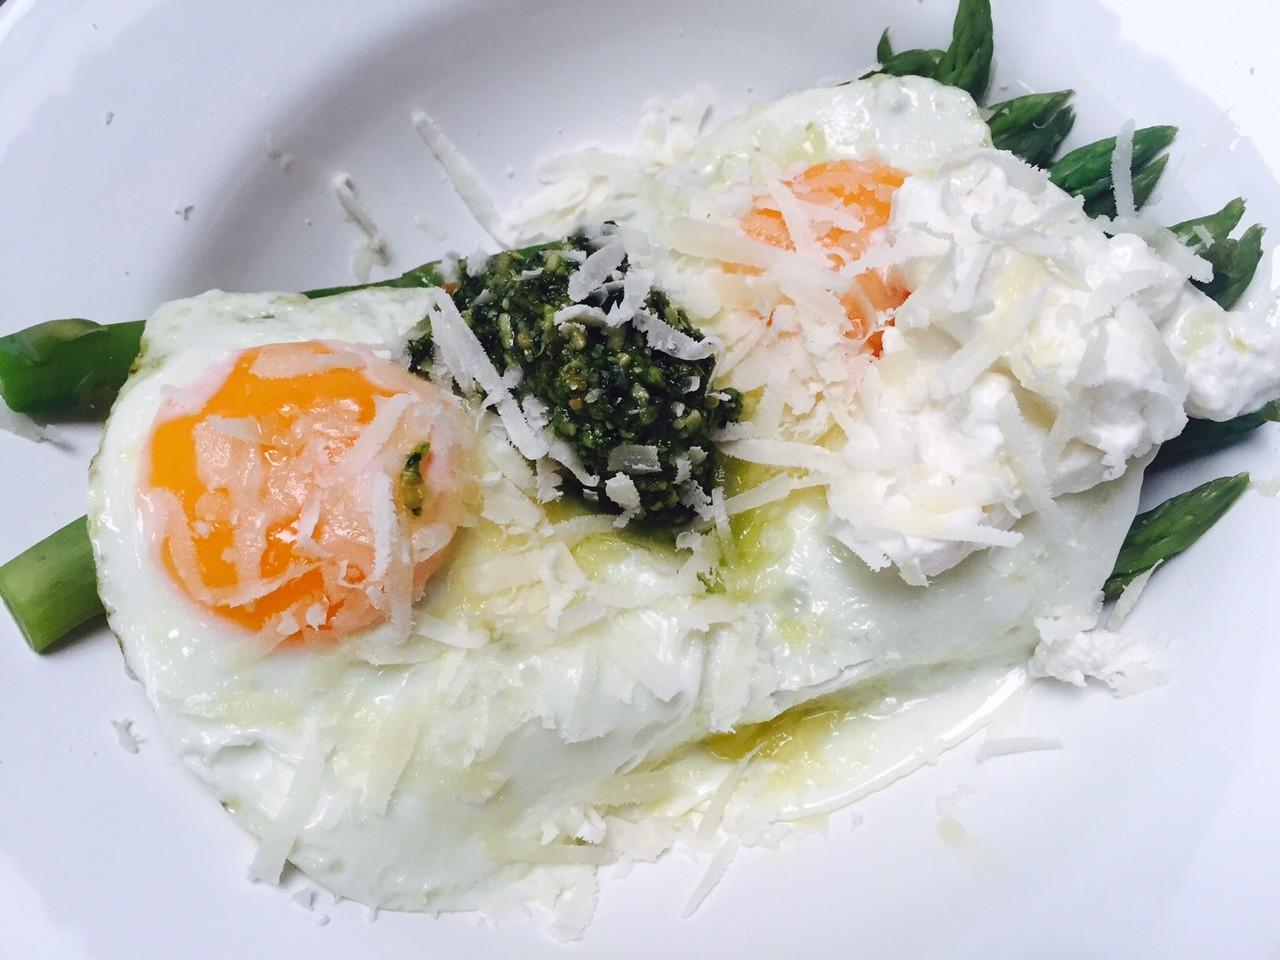 Groene asperge salade met ei recept van Foodblog Foodinista